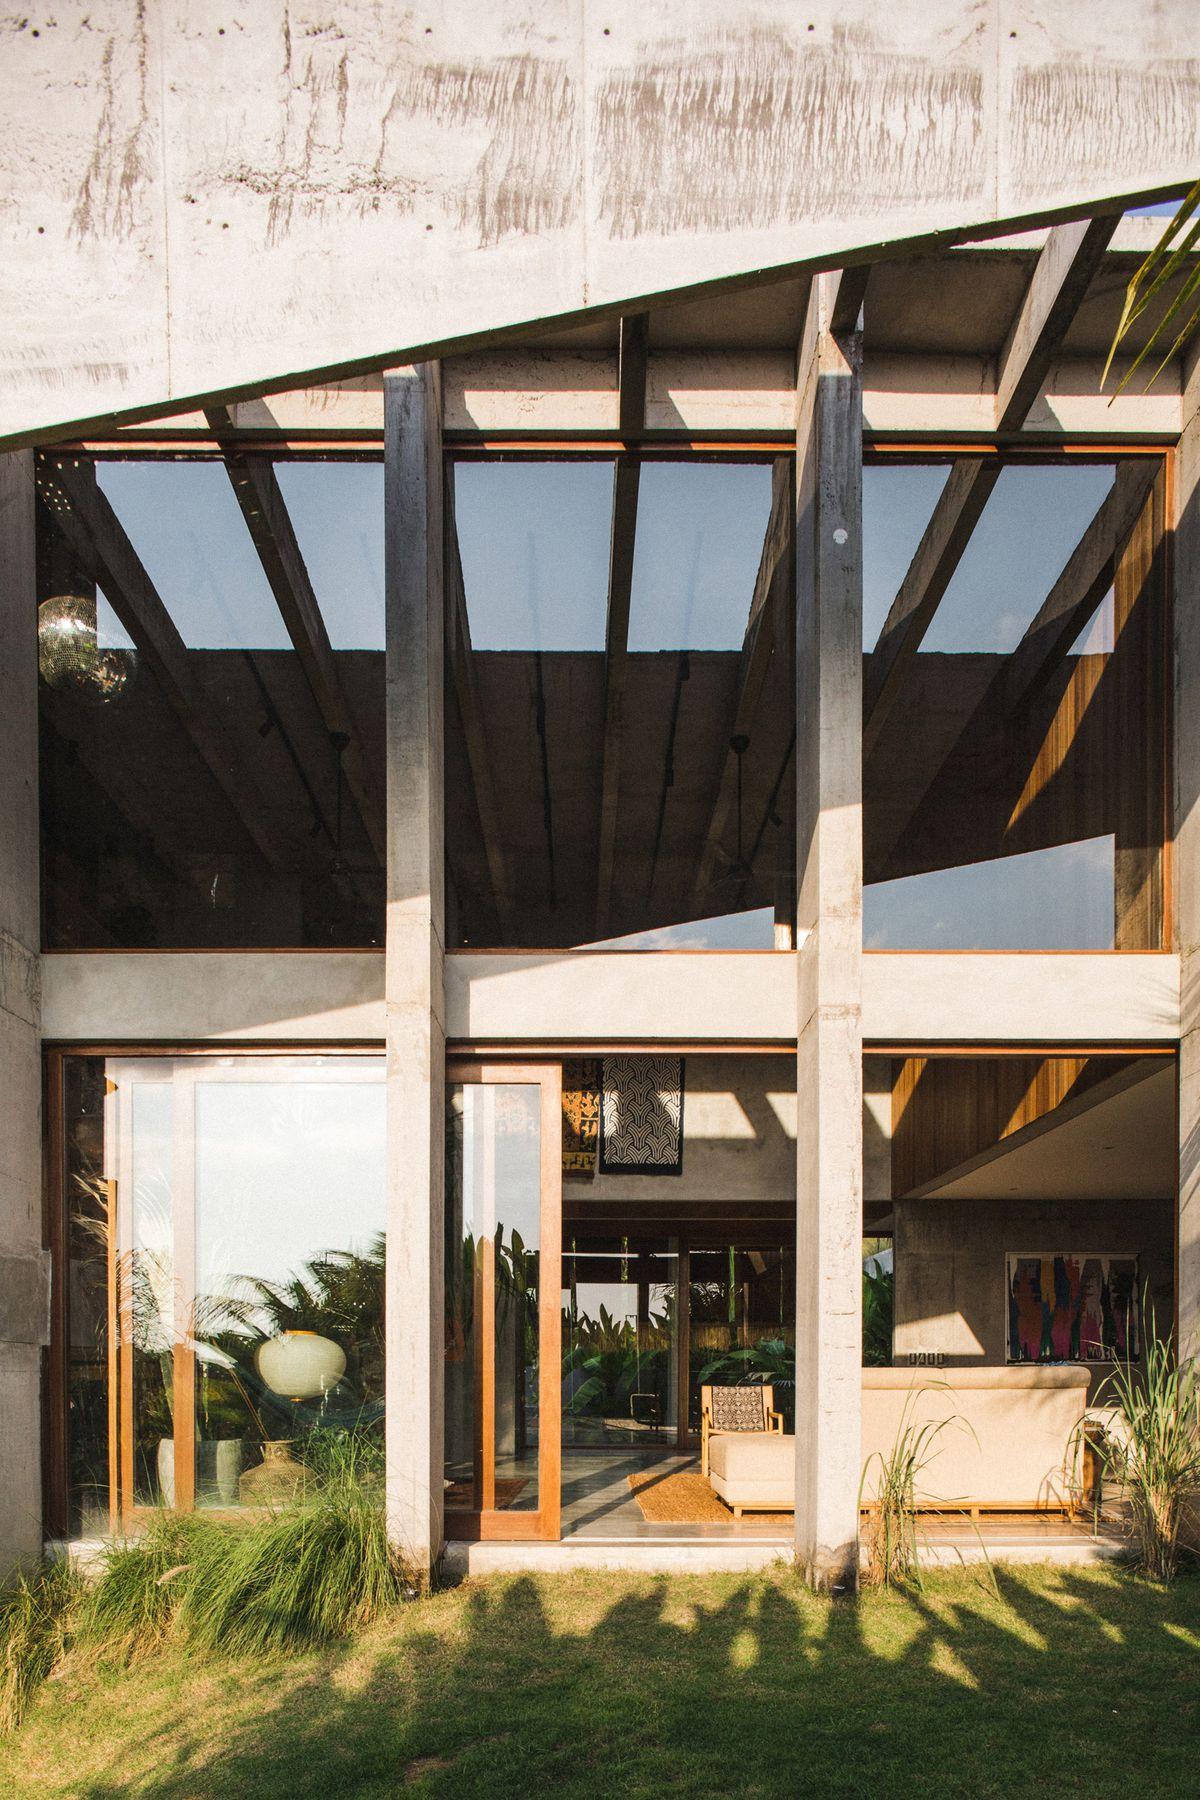 House with big glass windows